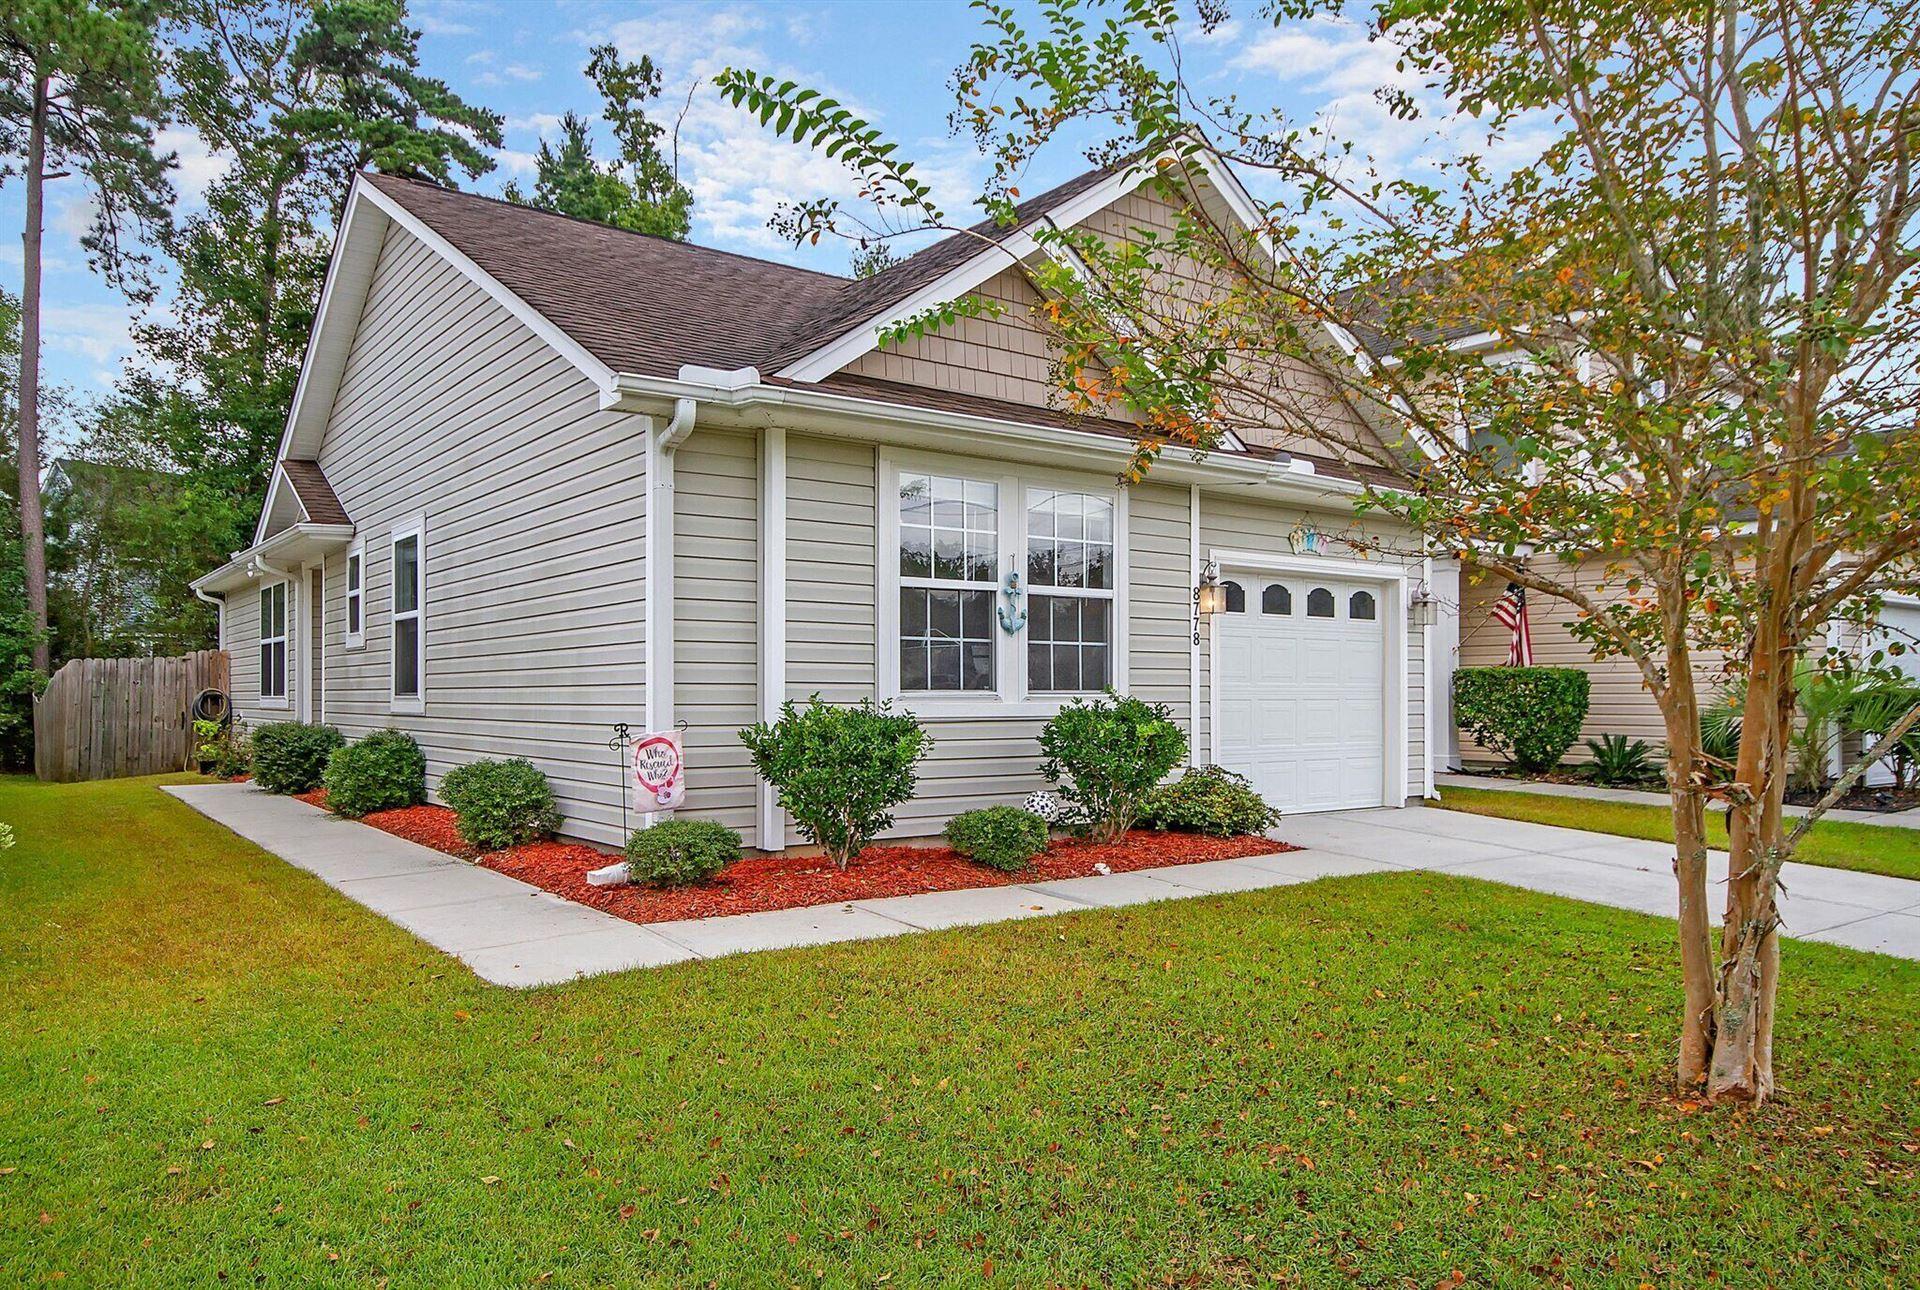 Photo of 8778 Shadowglen Drive, North Charleston, SC 29420 (MLS # 21025532)